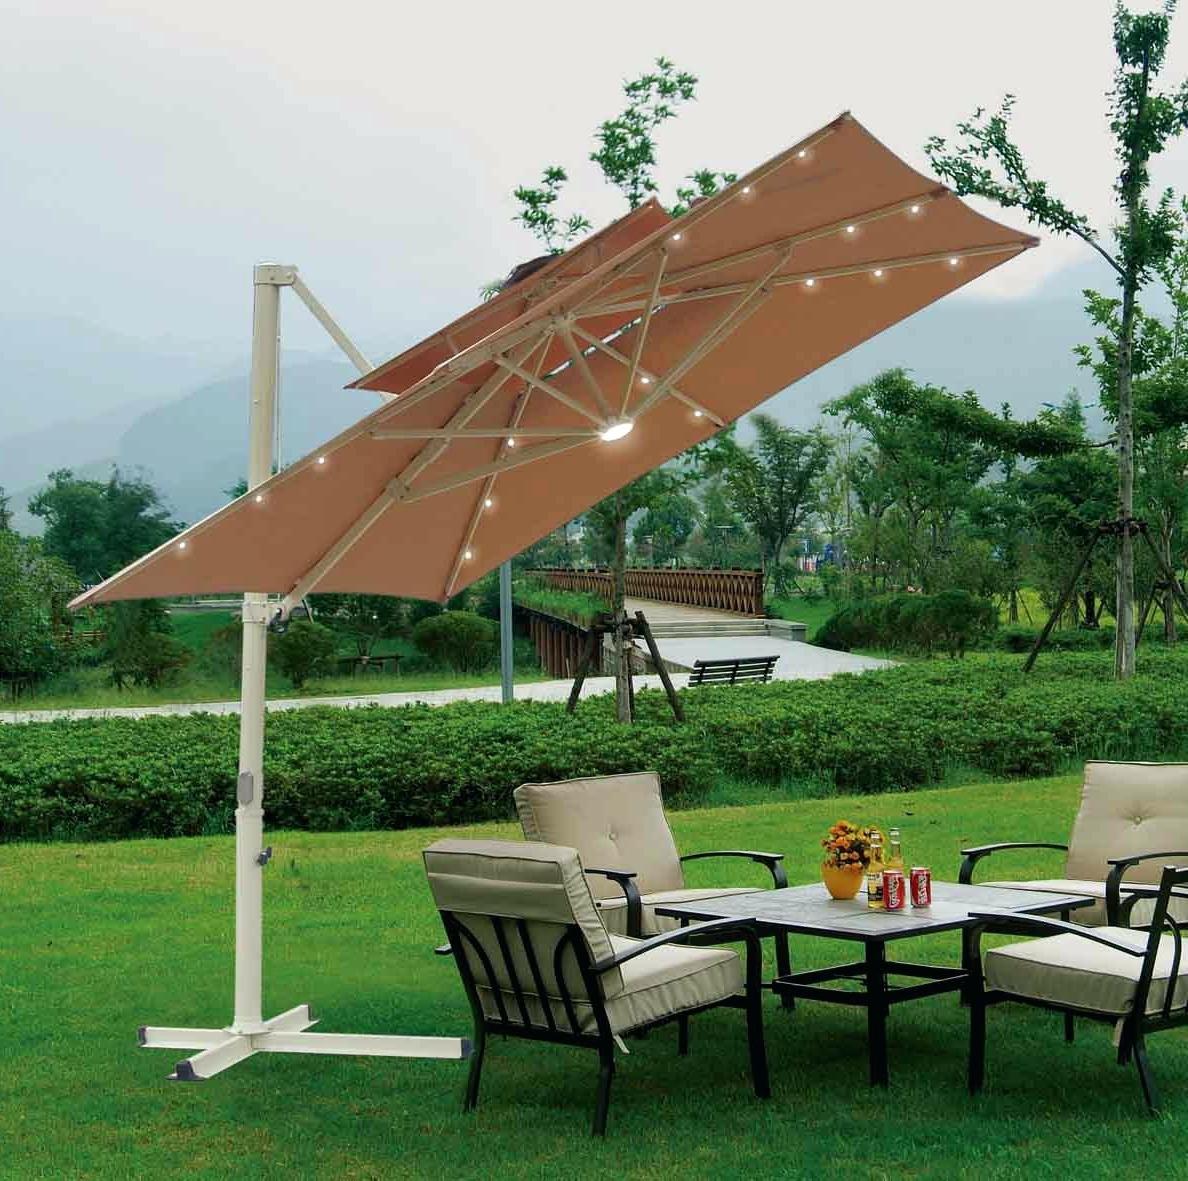 Offset Patio Umbrella Wind Stabilizer • Patio Ideas Throughout Favorite Offset Patio Umbrellas (View 16 of 20)